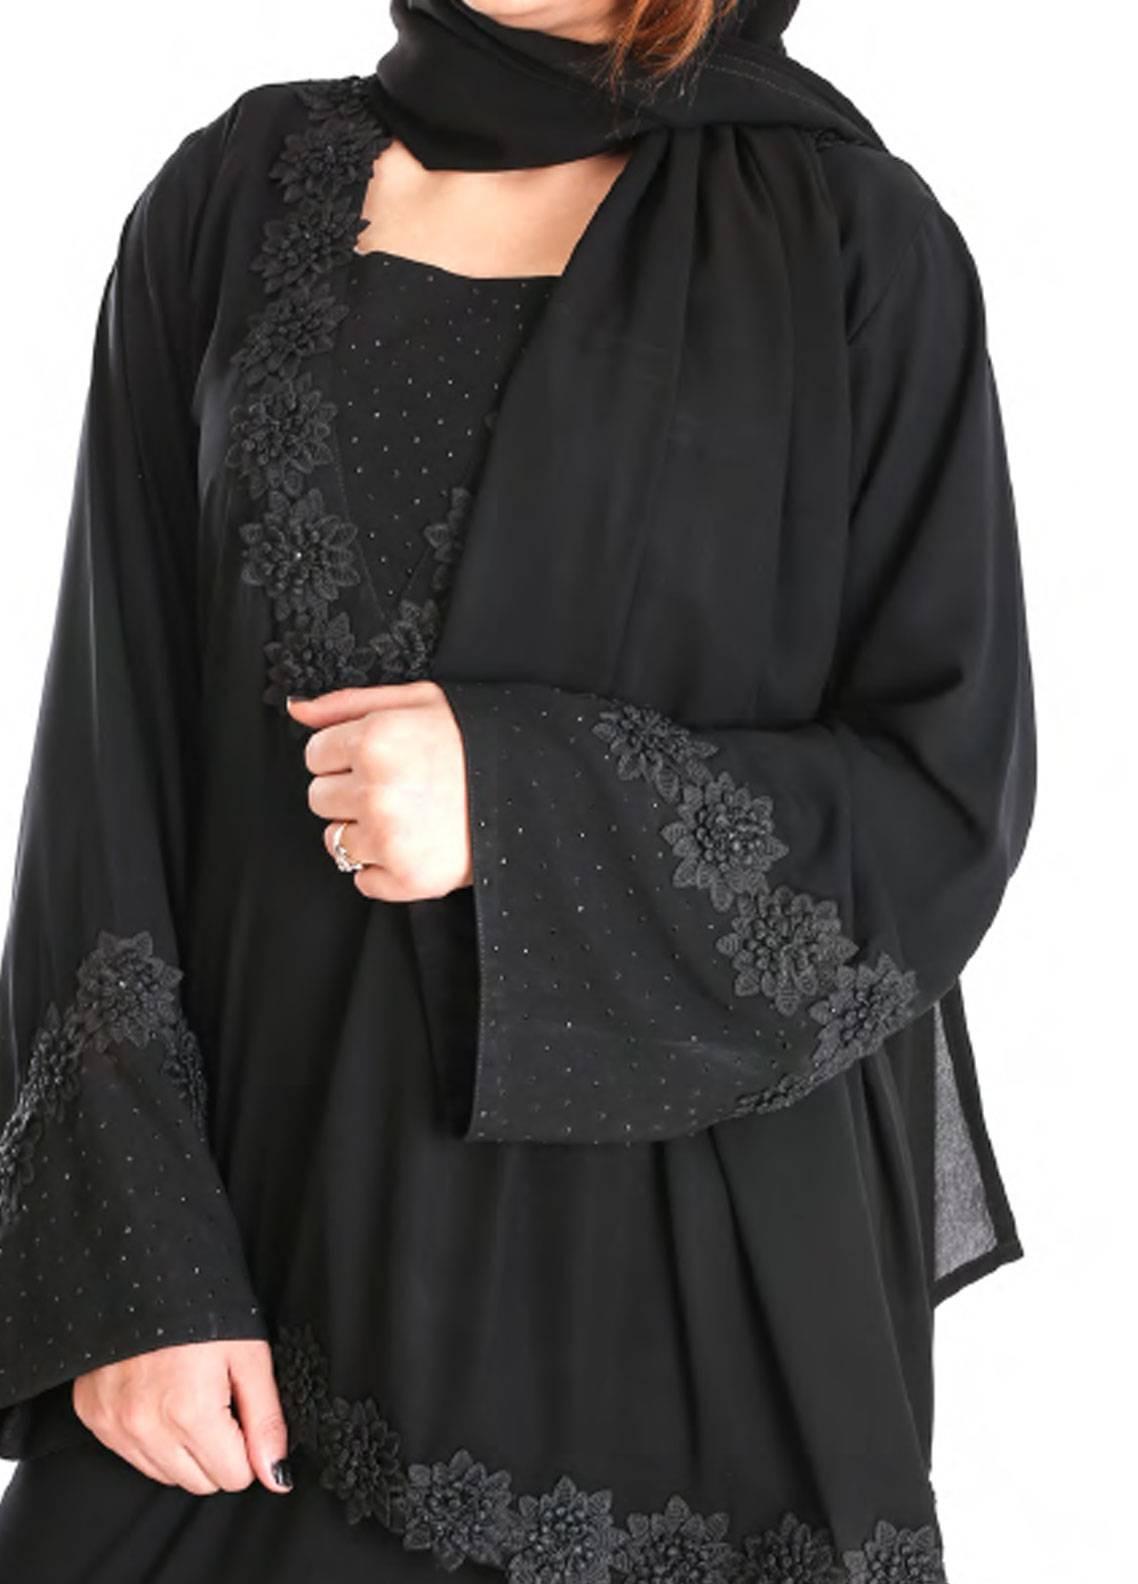 Hijab ul Hareem Formal  Stitched Abaya 0120-RC-921